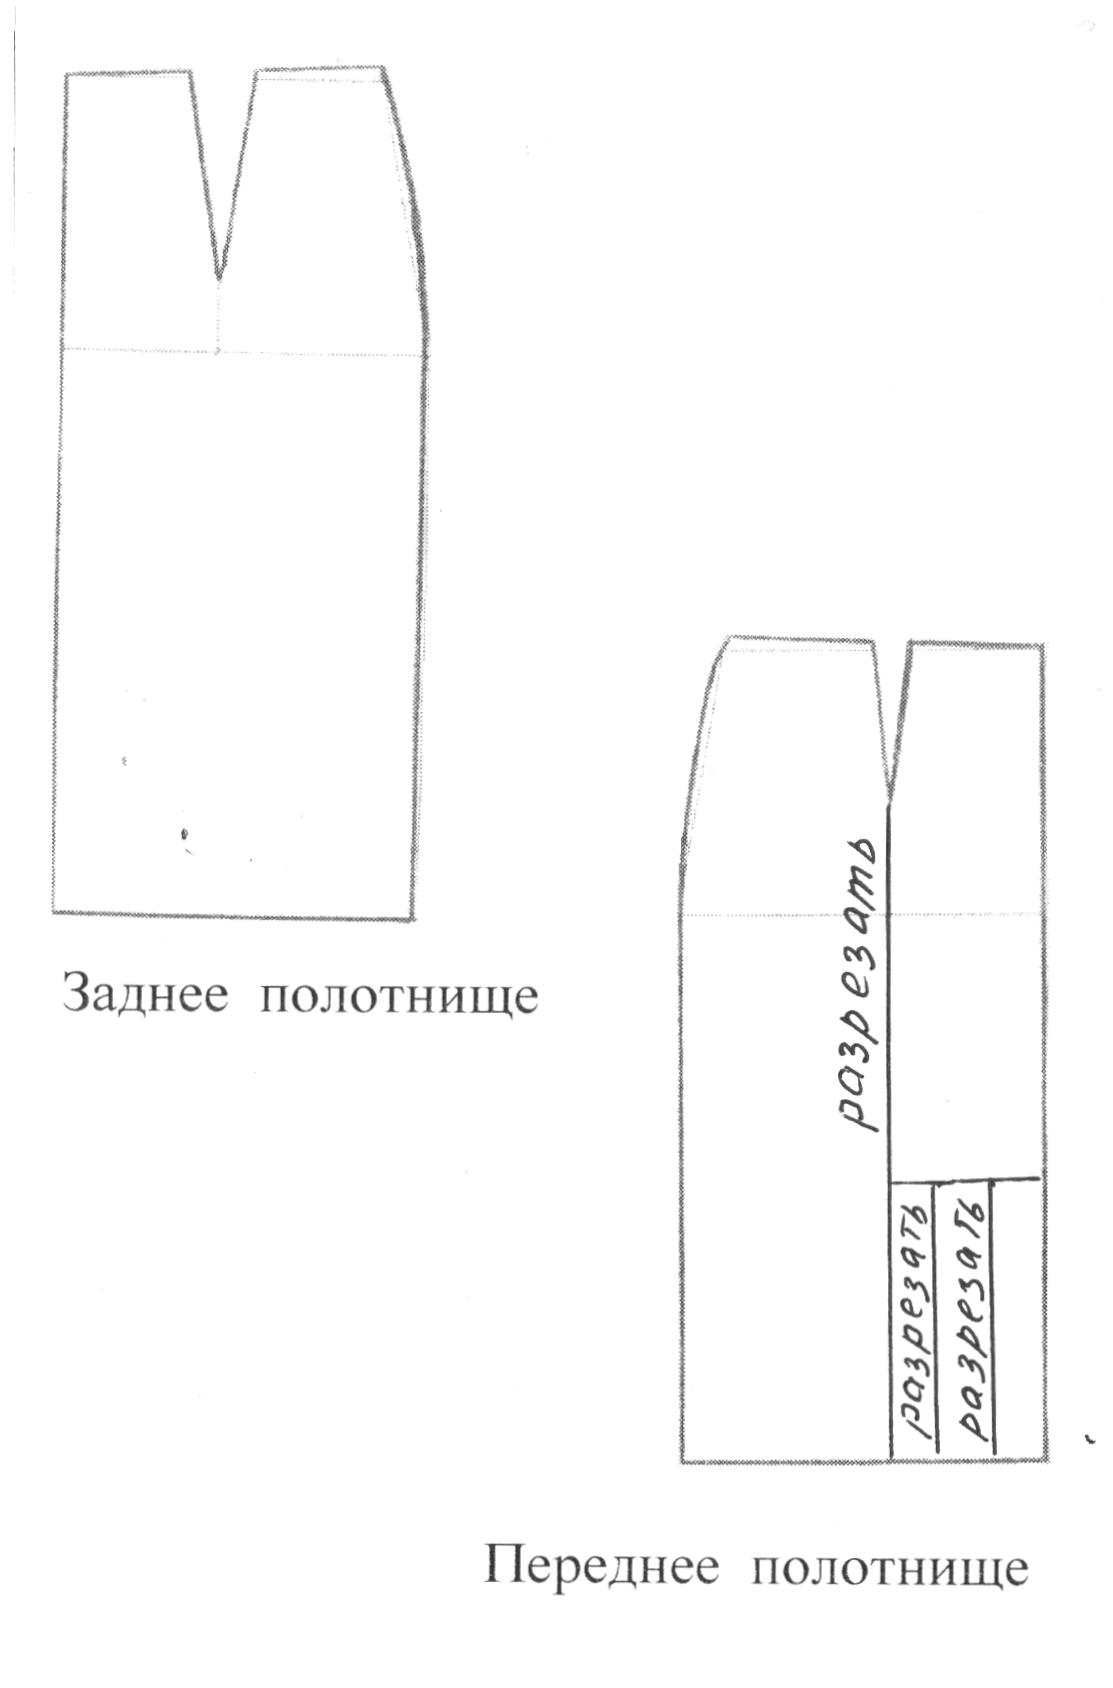 C:\Documents and Settings\Администратор\Рабочий стол\для ИЗО\6.bmp